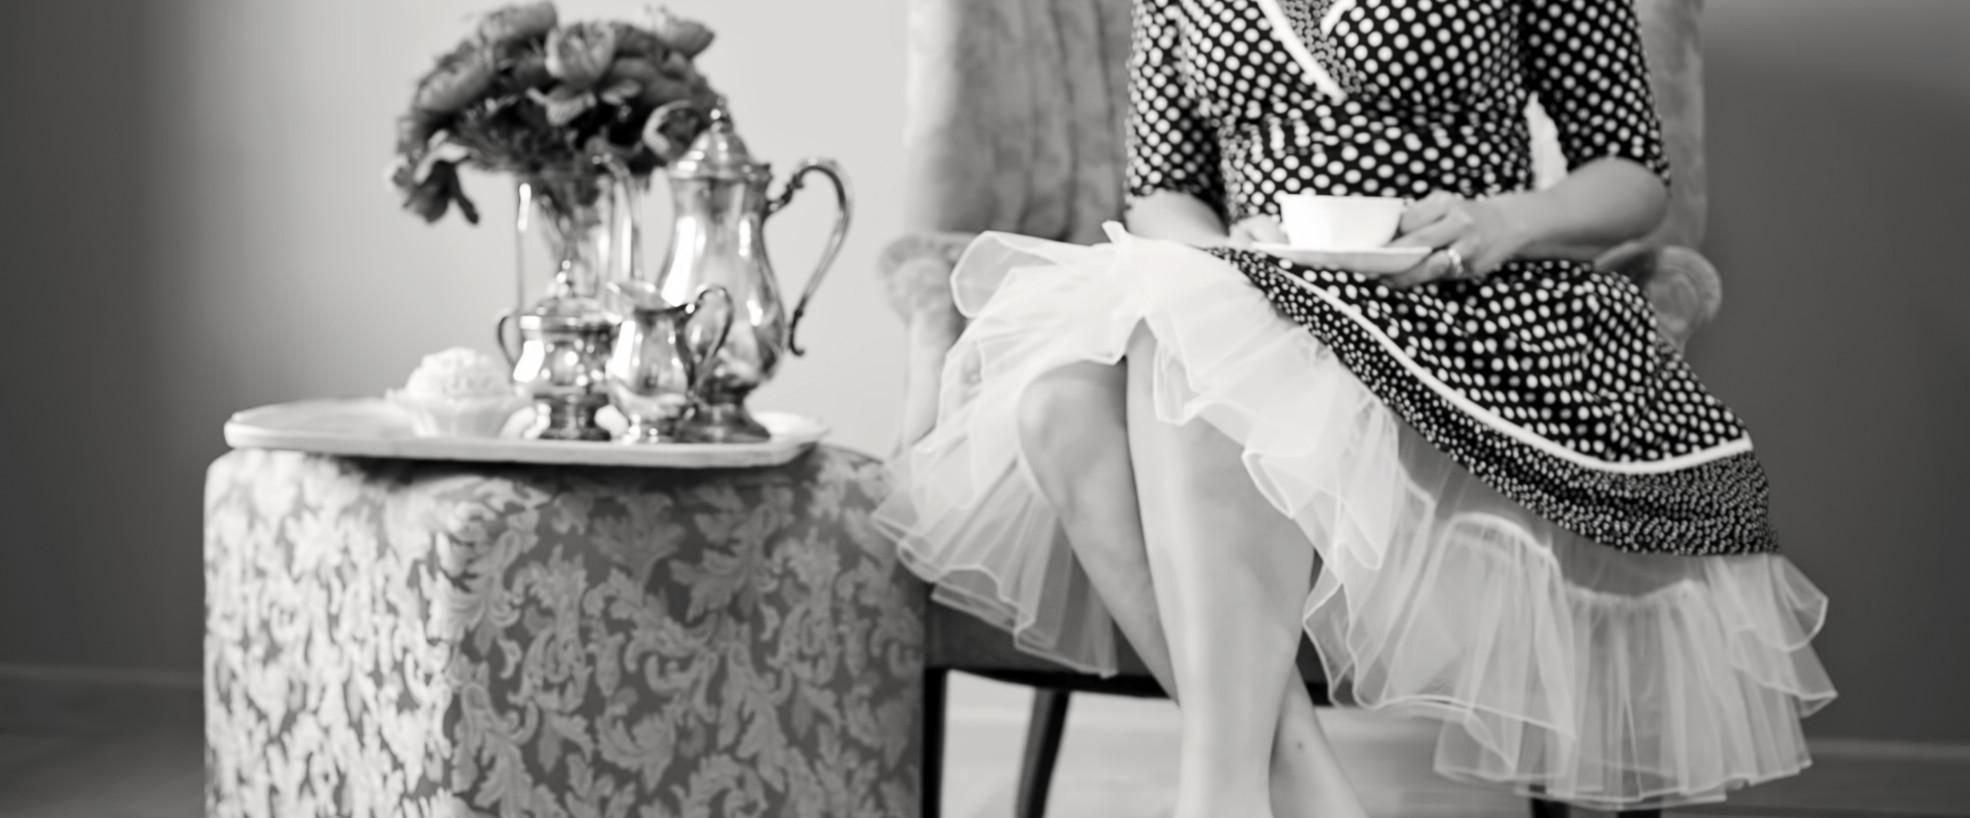 Vintage Abiti D'epoca '40 E Costumi Anni Noleggio iuOPZXk